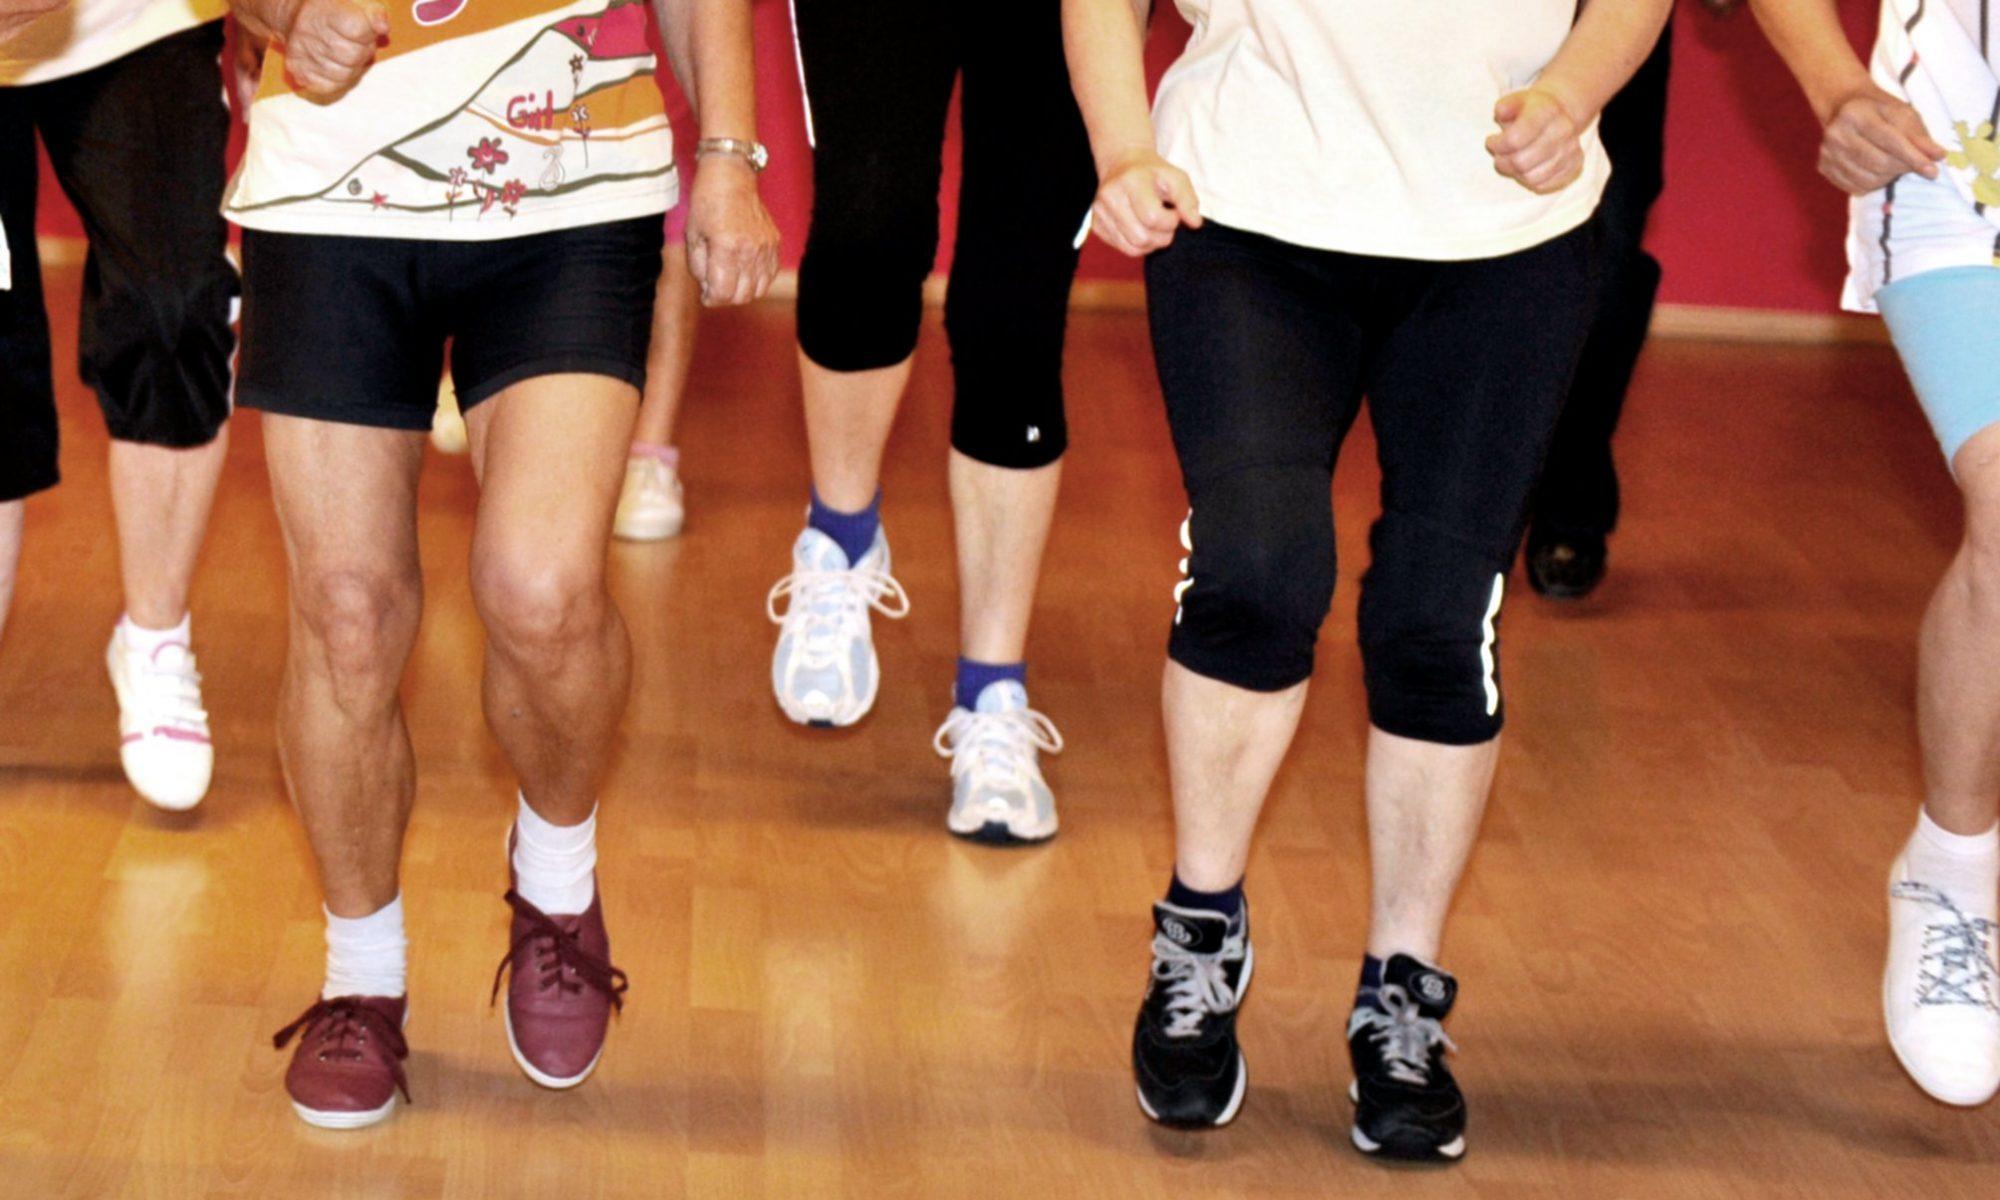 BSG185 e.V. - Gesundheitssport